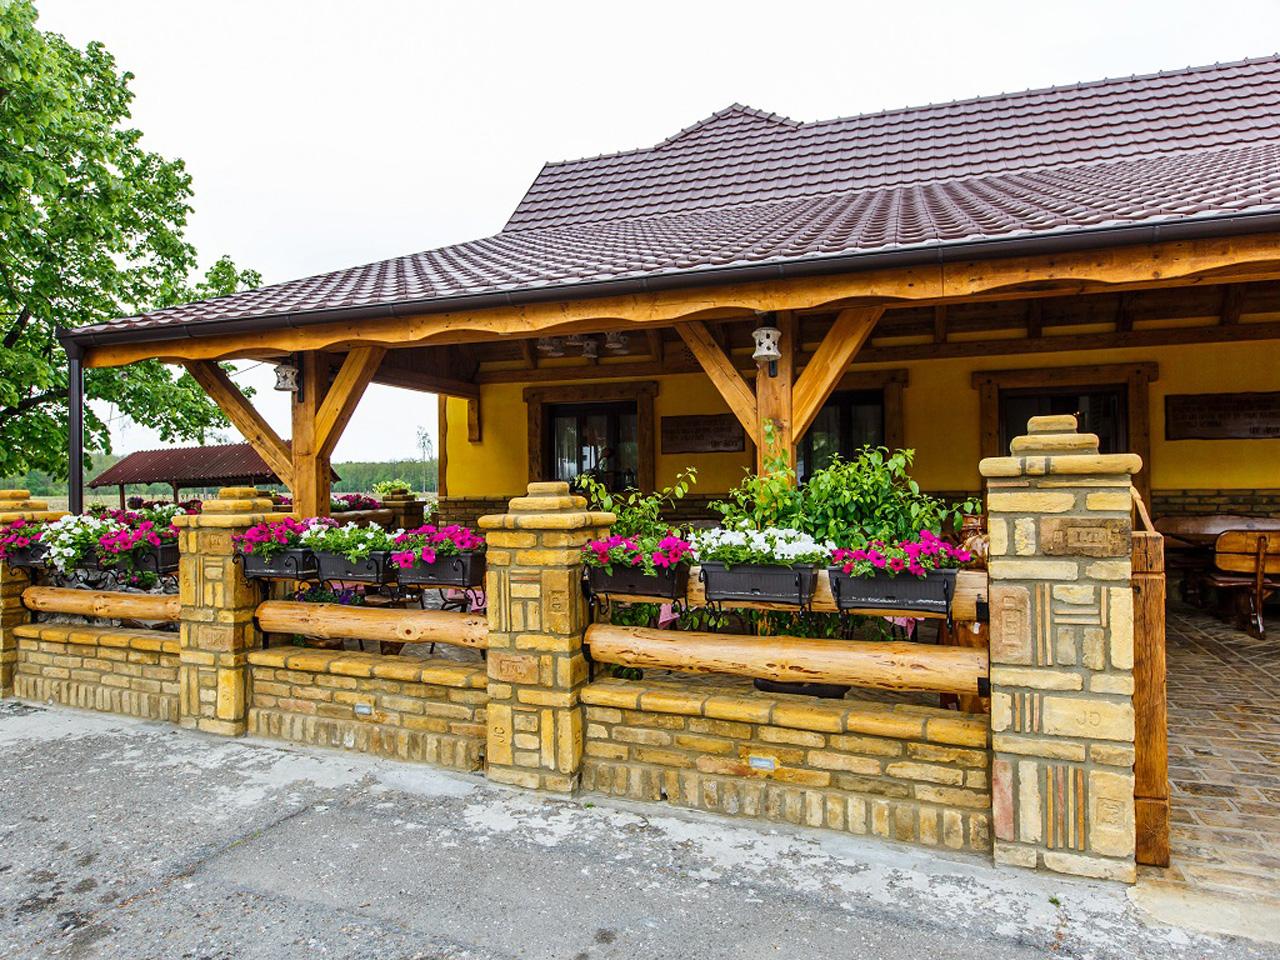 RESTORAN ŠUMSKI MIR Restorani Ruma